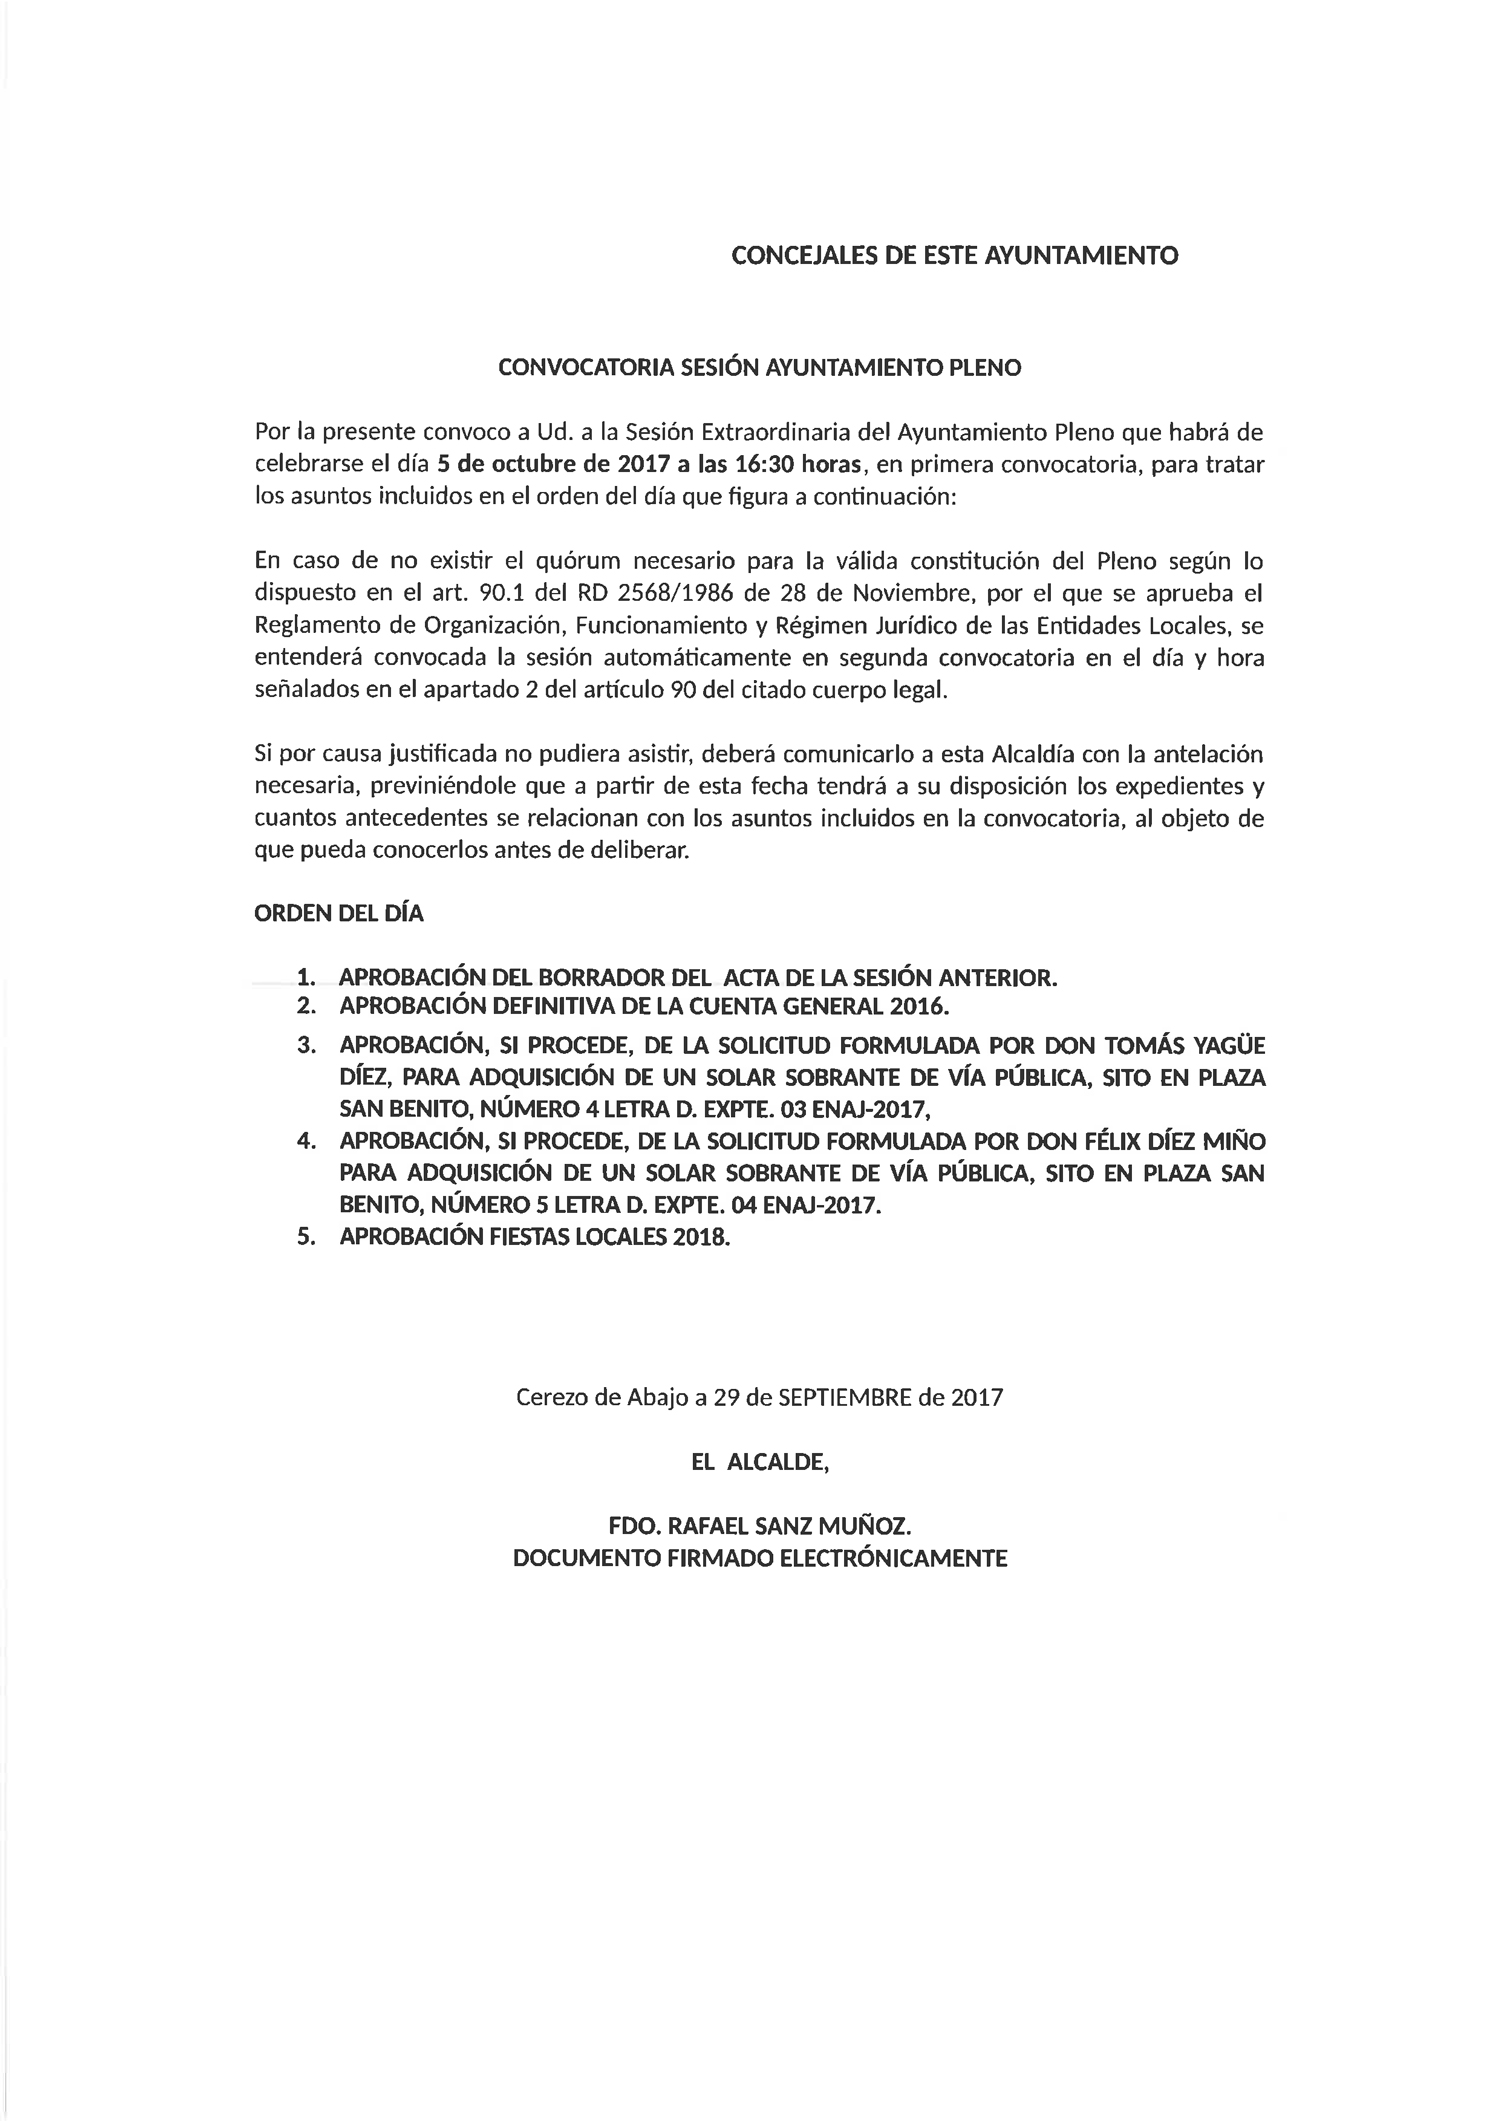 https://cerezodeabajo.com/wp-content/uploads/2017/10/2017-ACTA-SESION-5-OCTUBRE-17.jpg